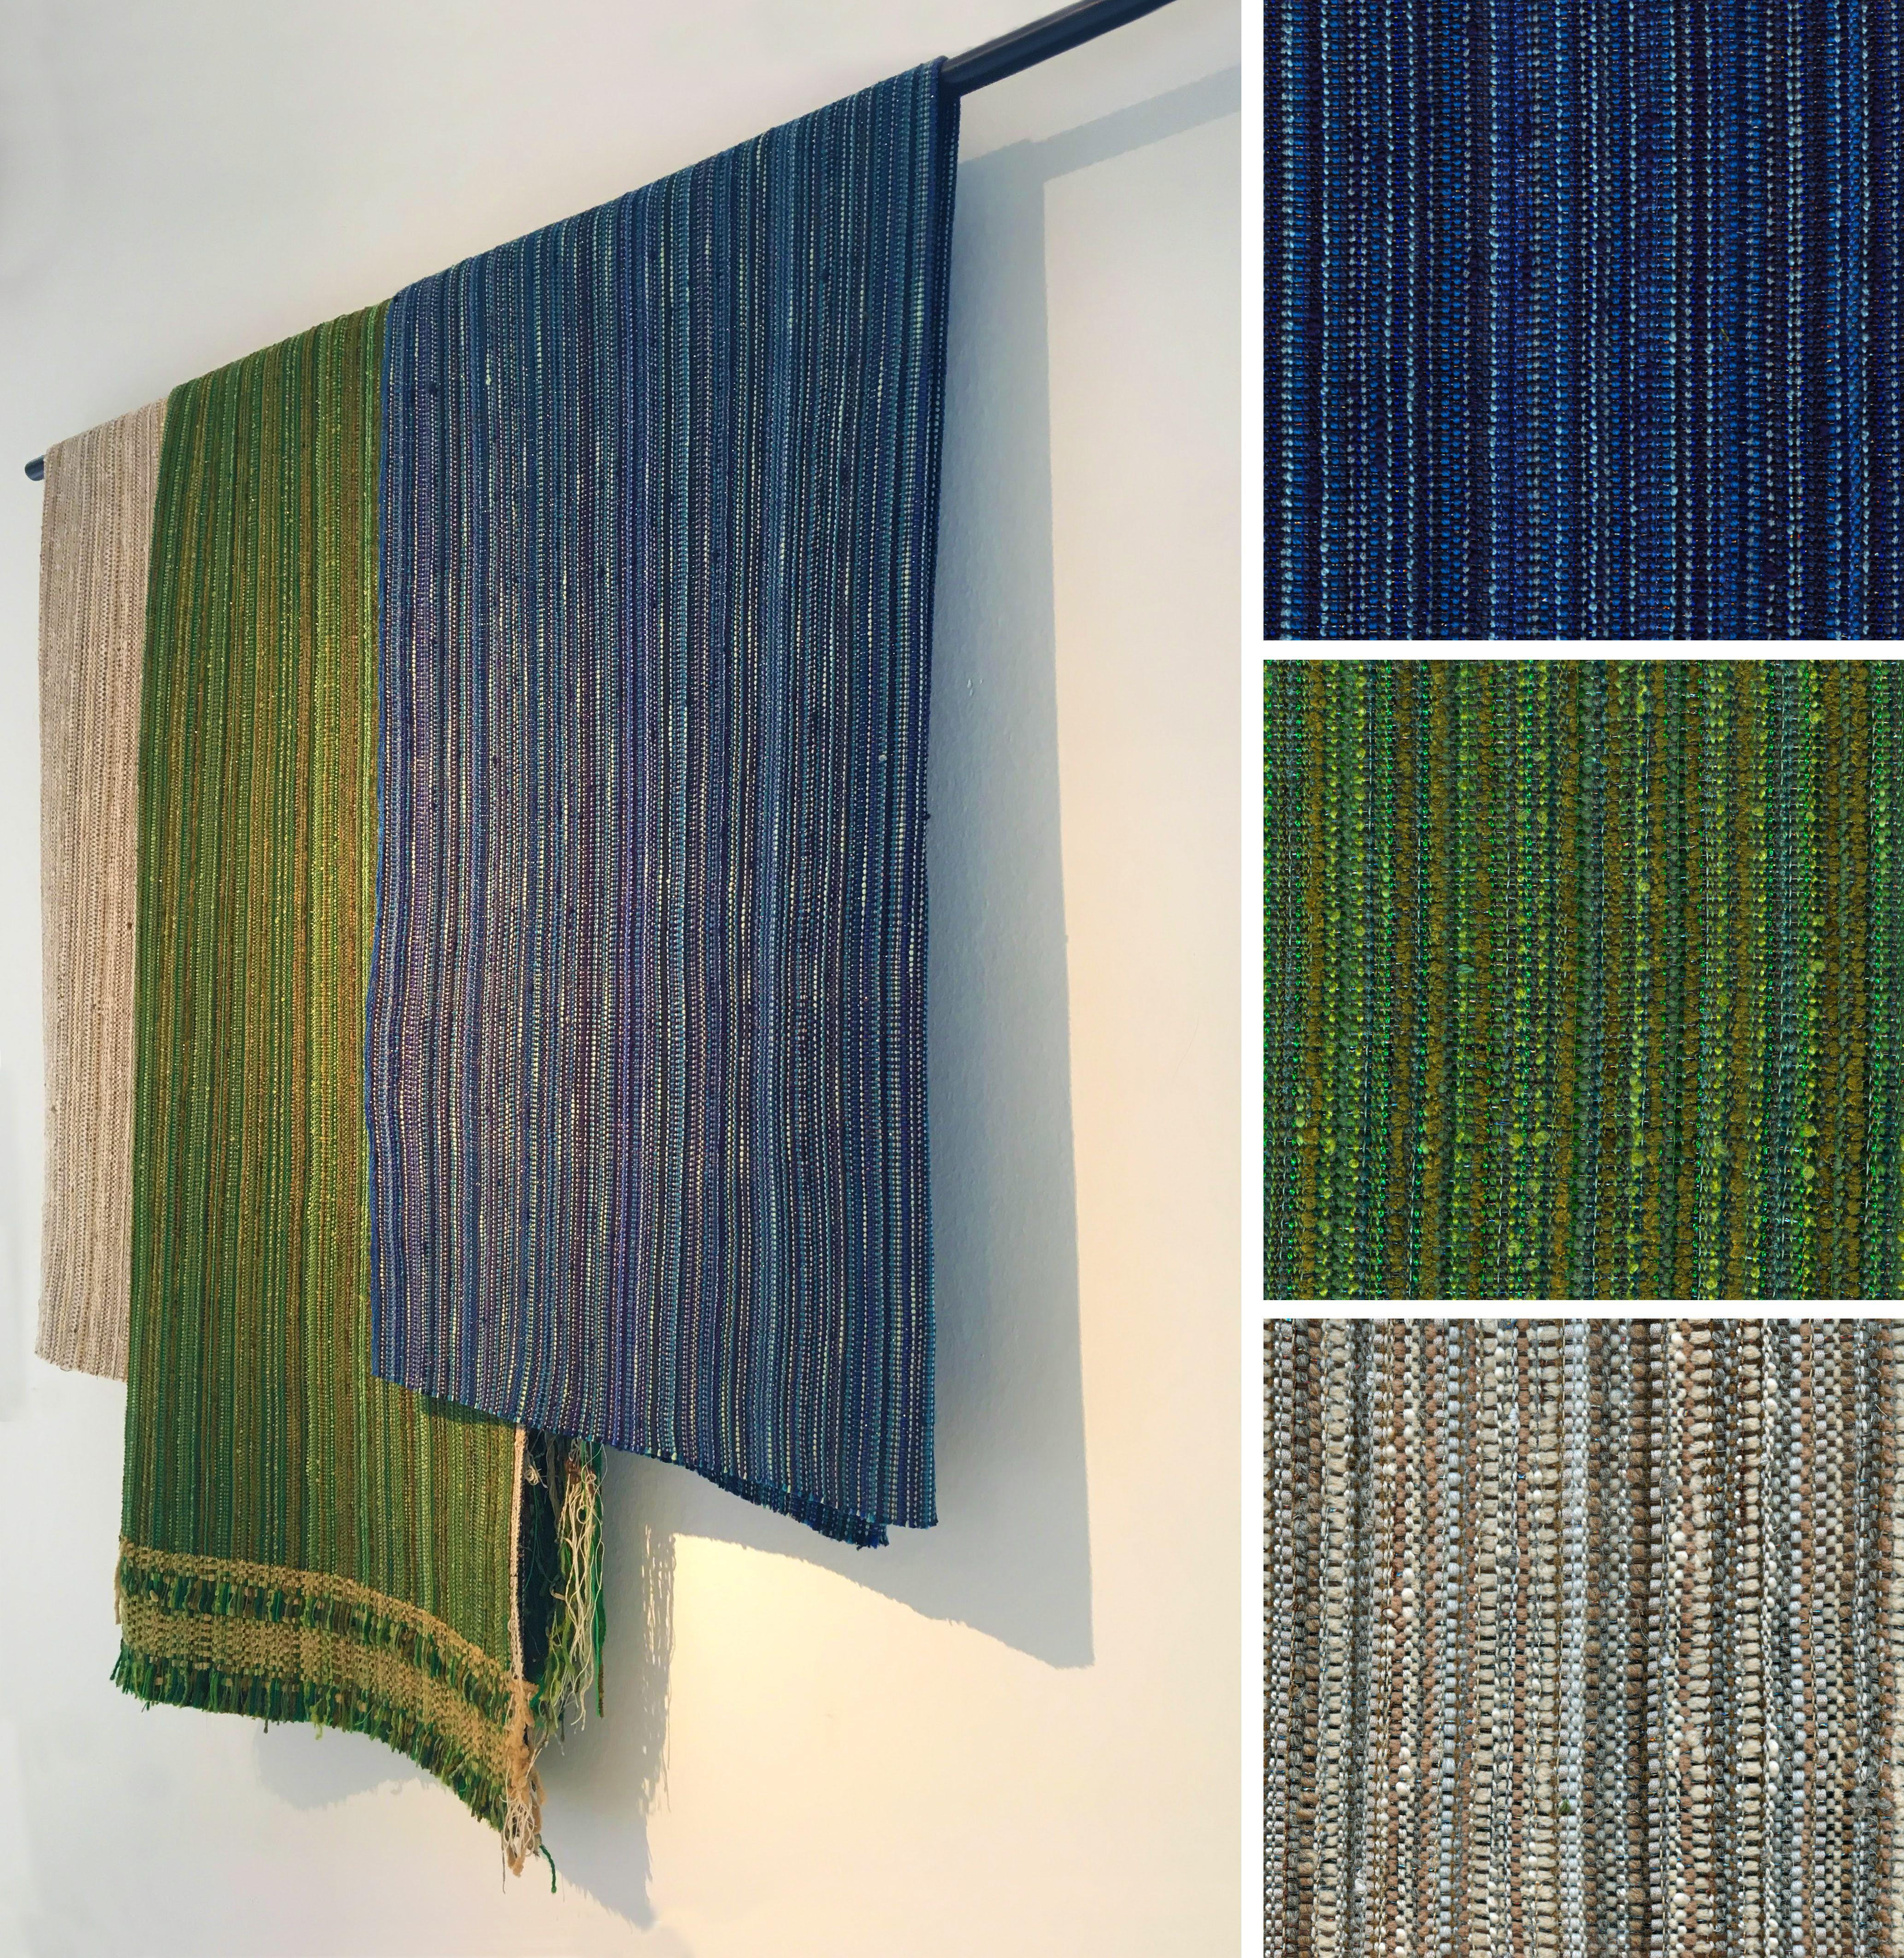 Biophilic Sustainable Interior Design Highlights From Broken